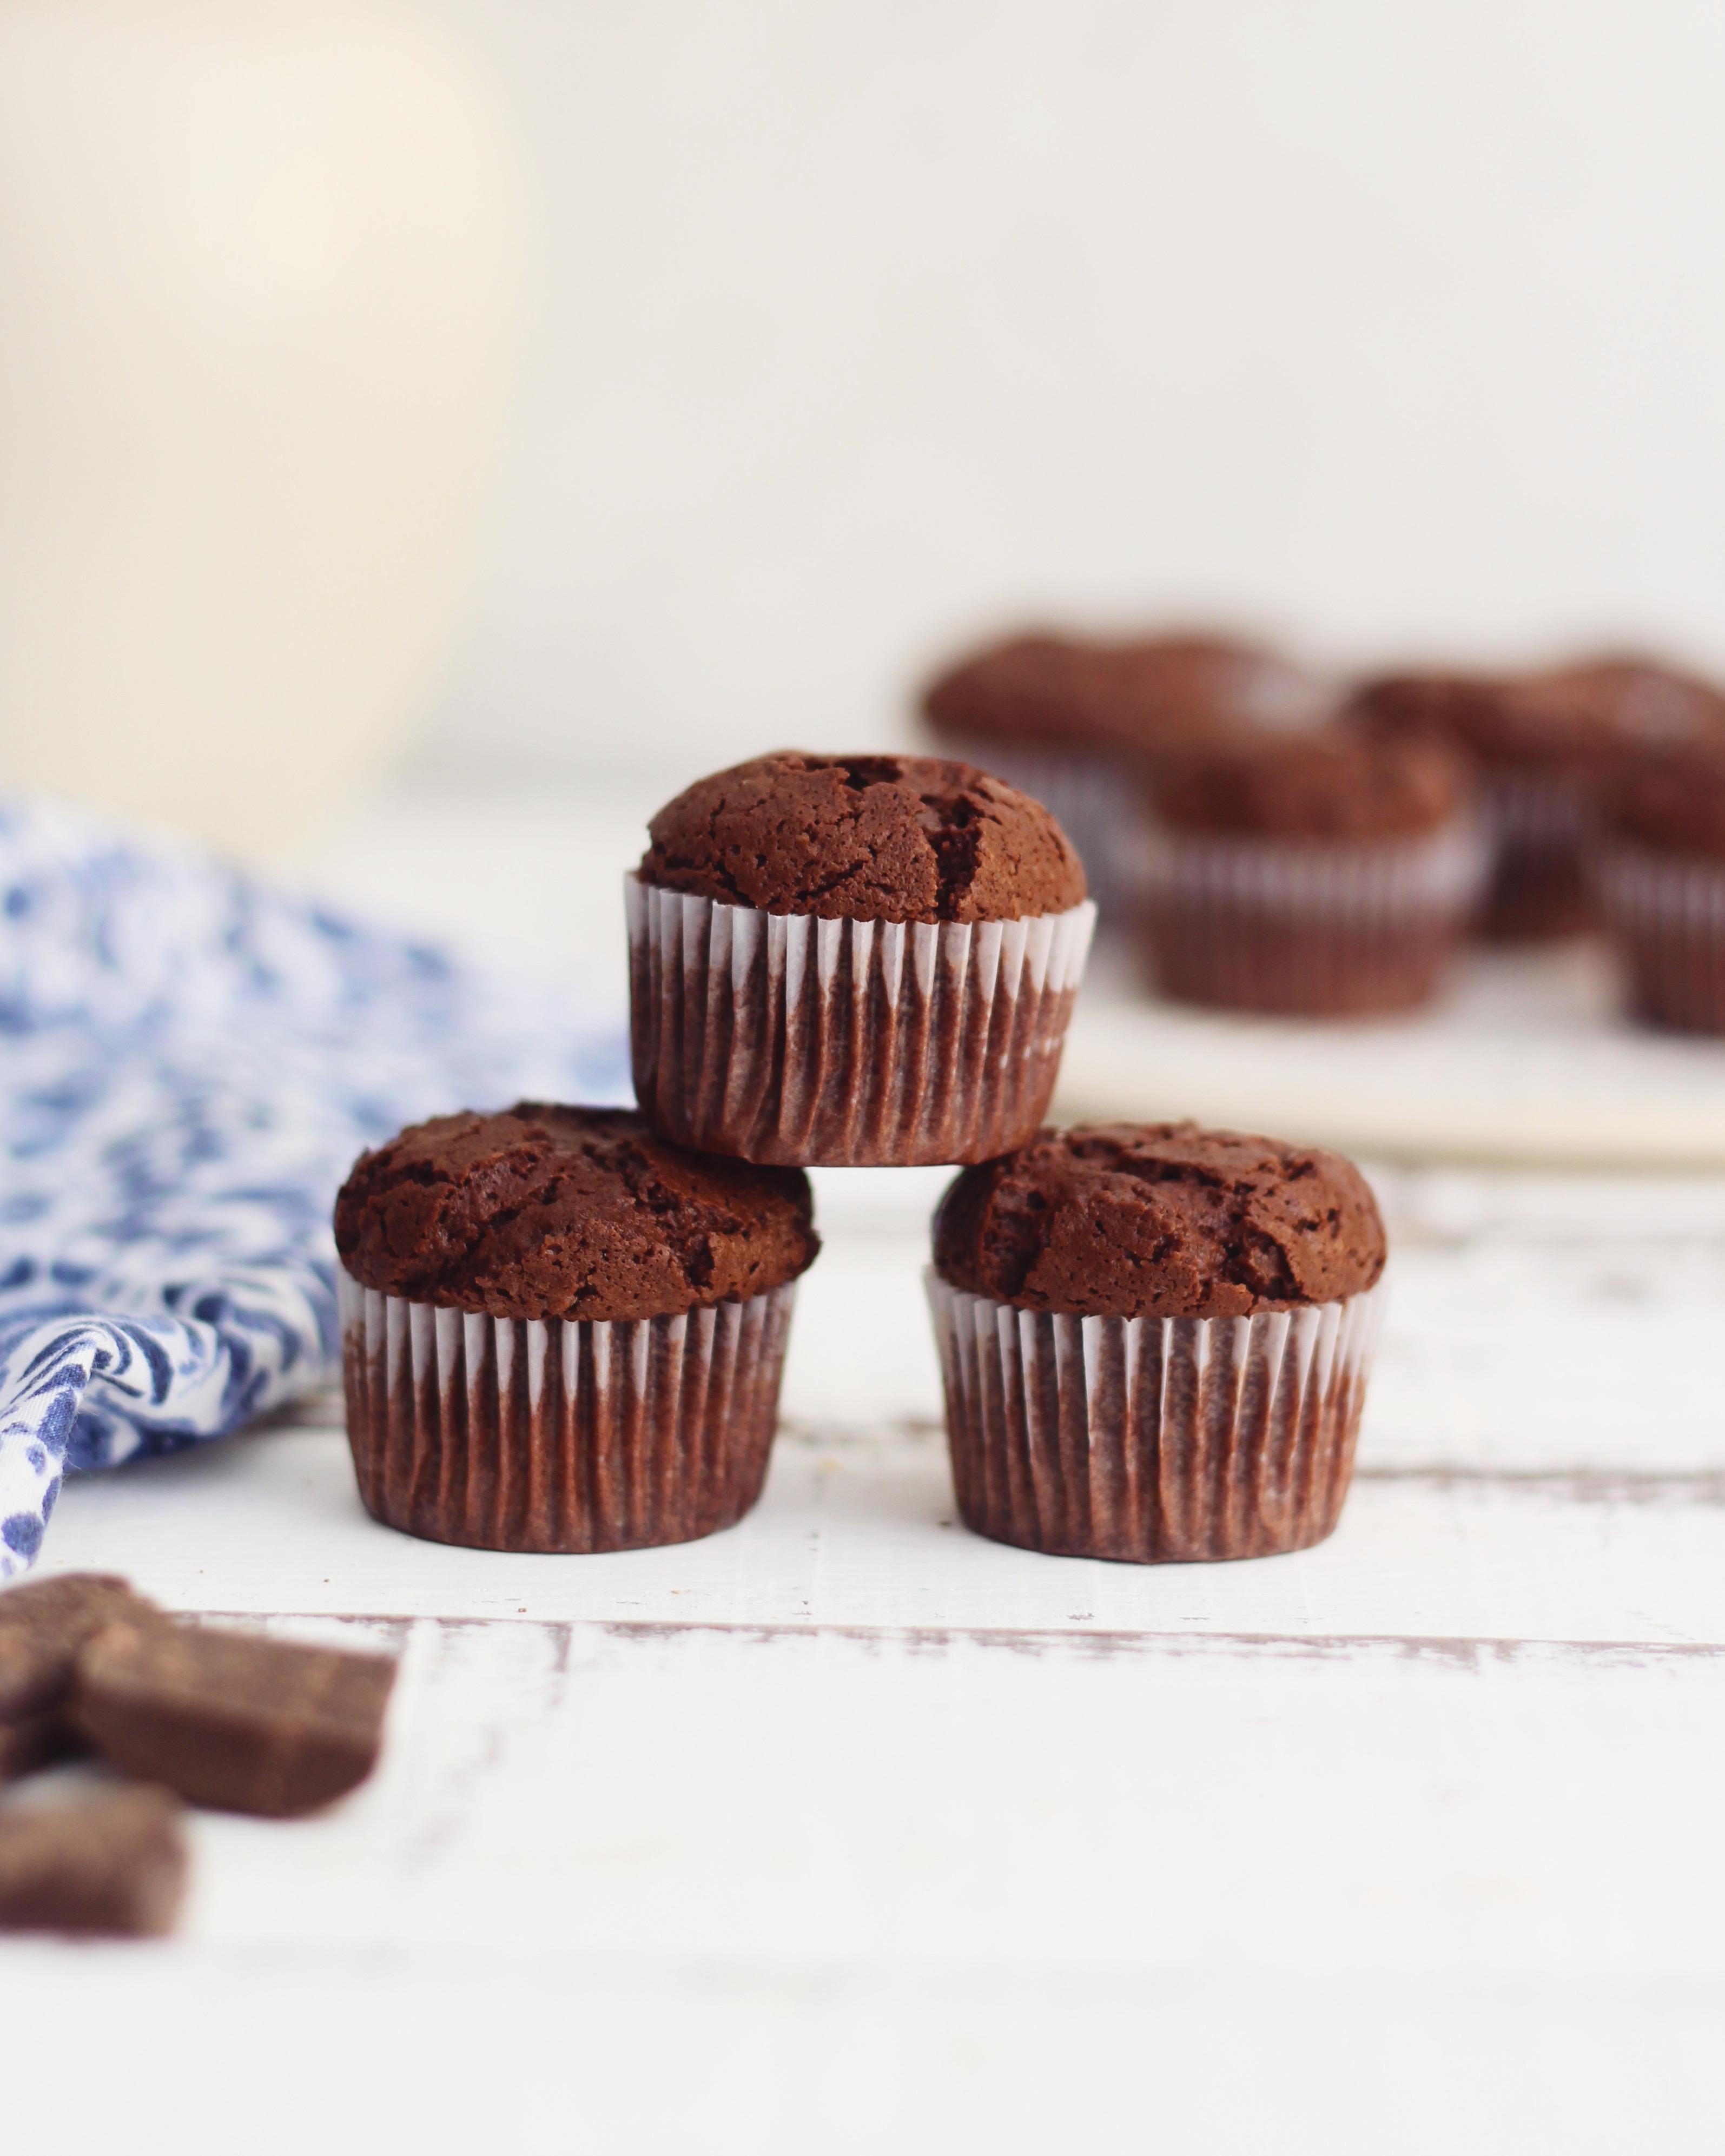 Muffins extra chocolate